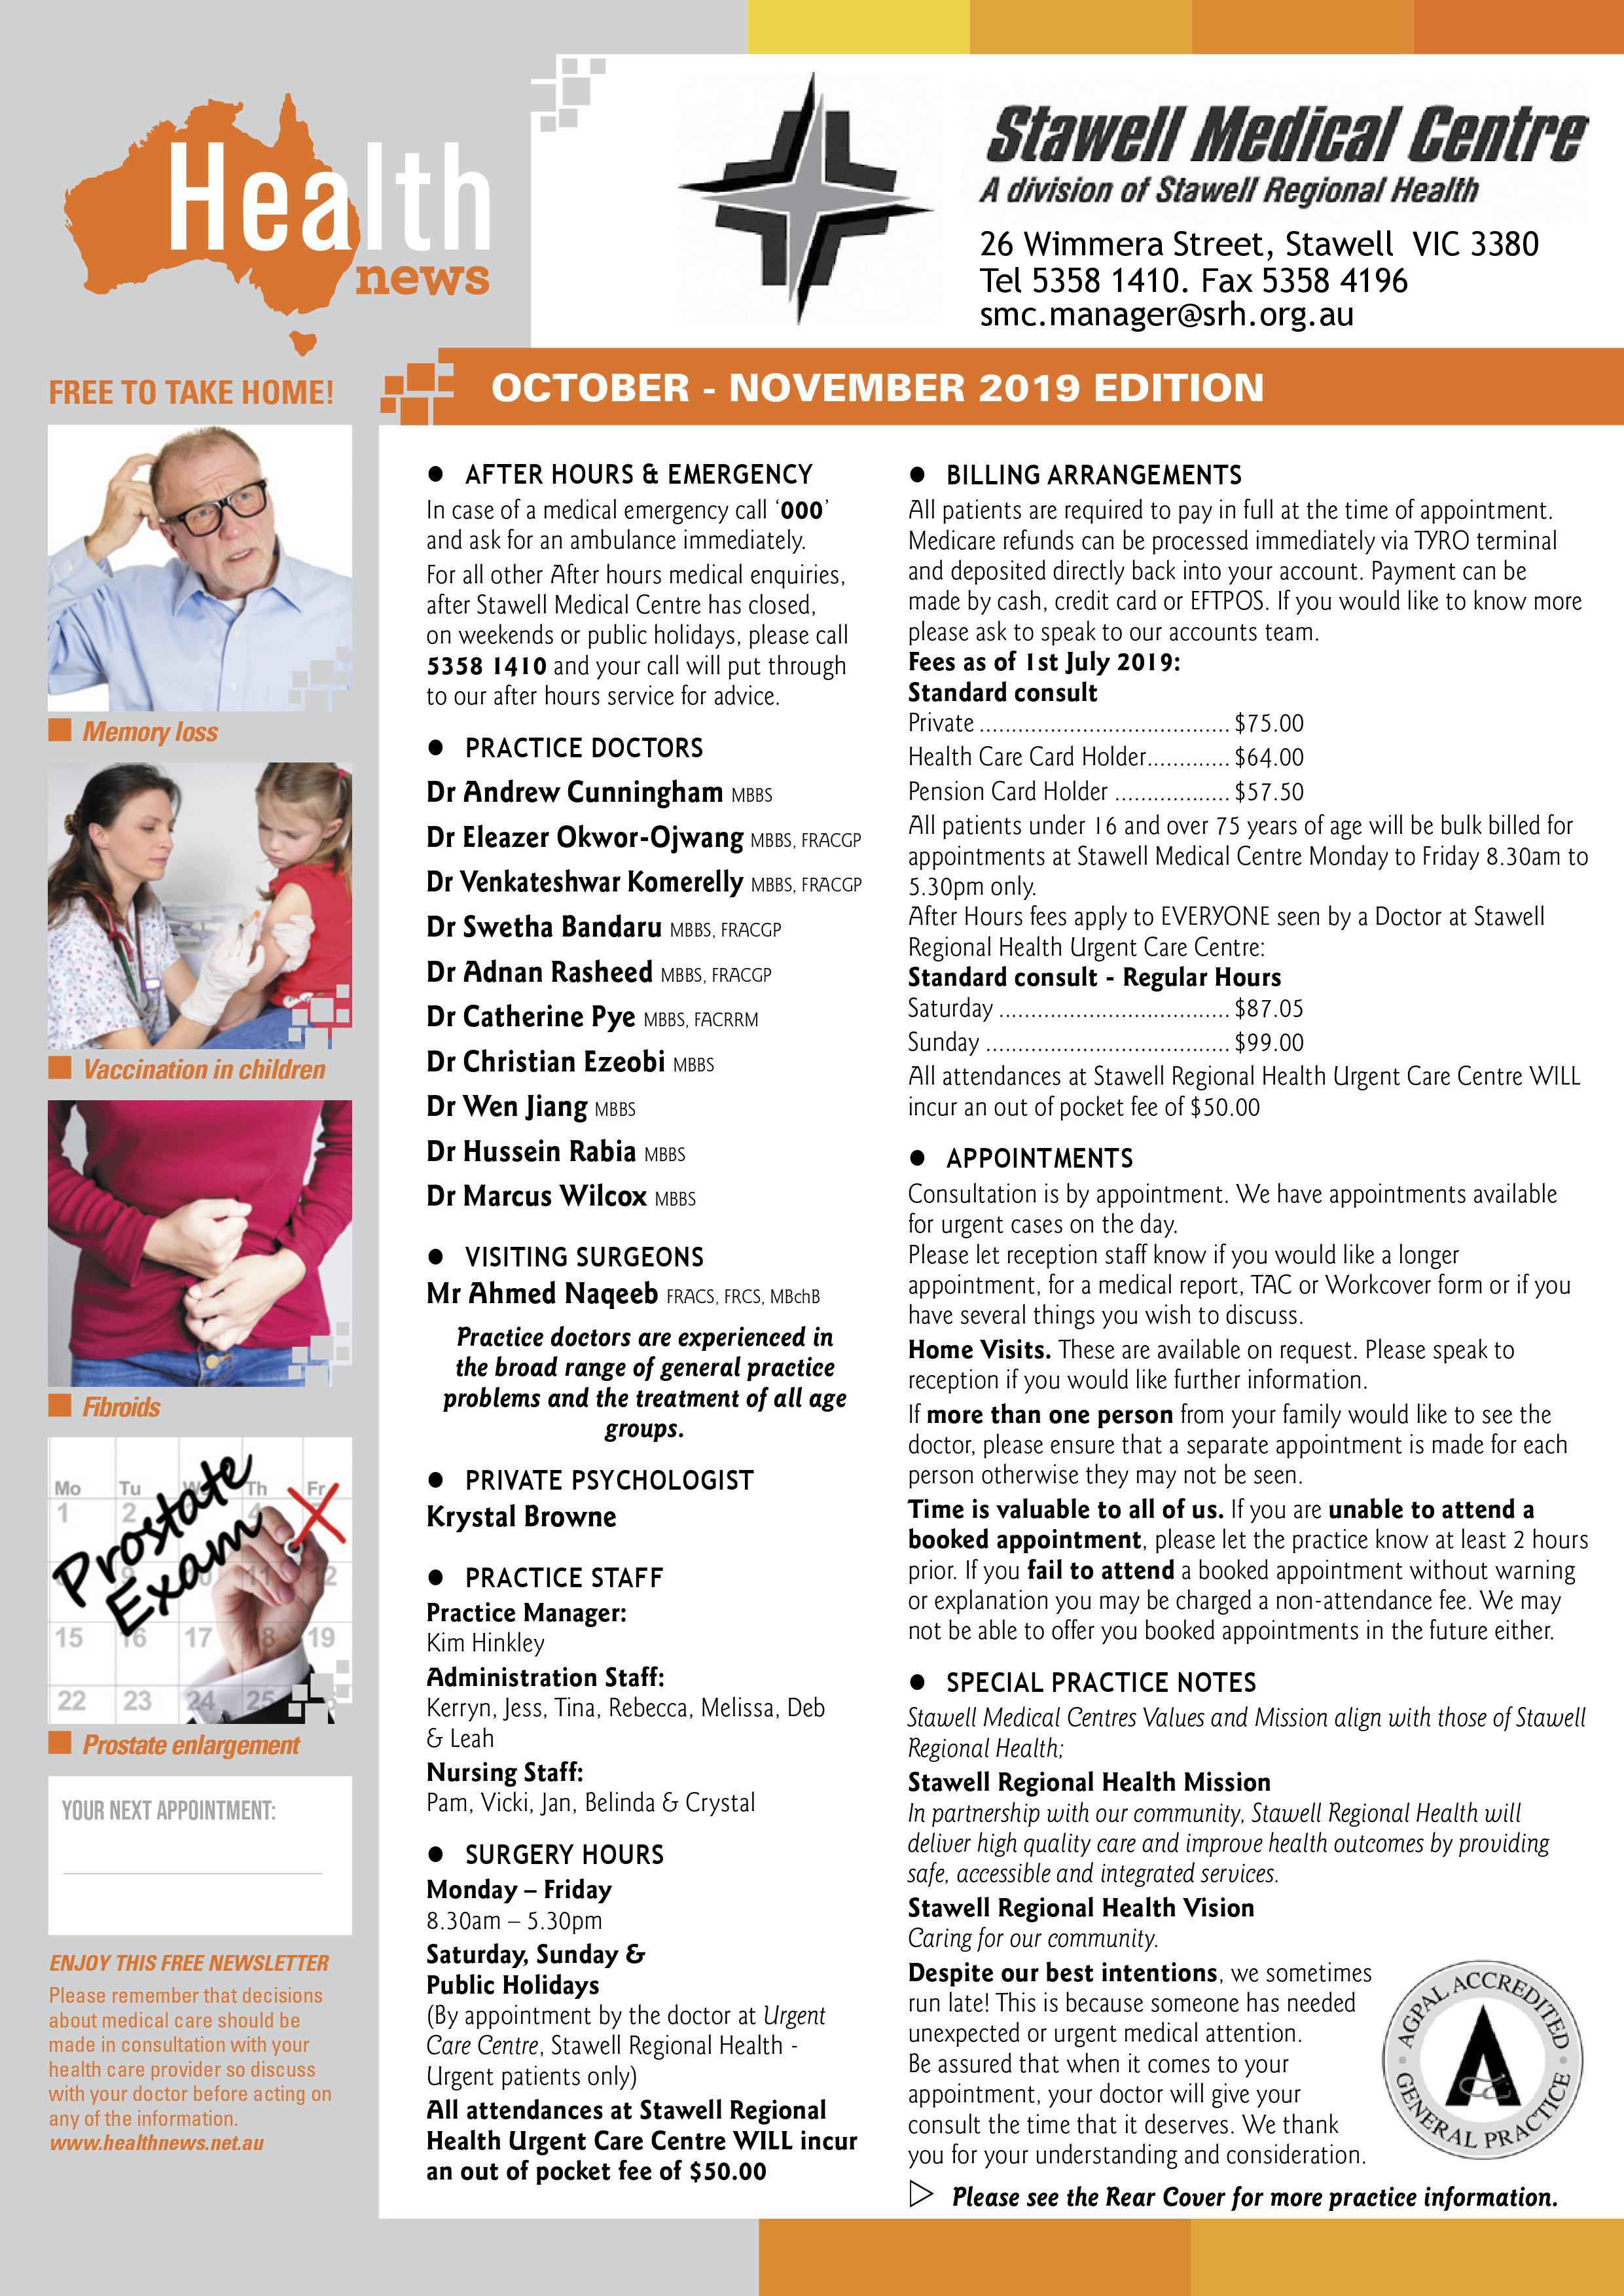 Stawell Medical Centre News October 2019